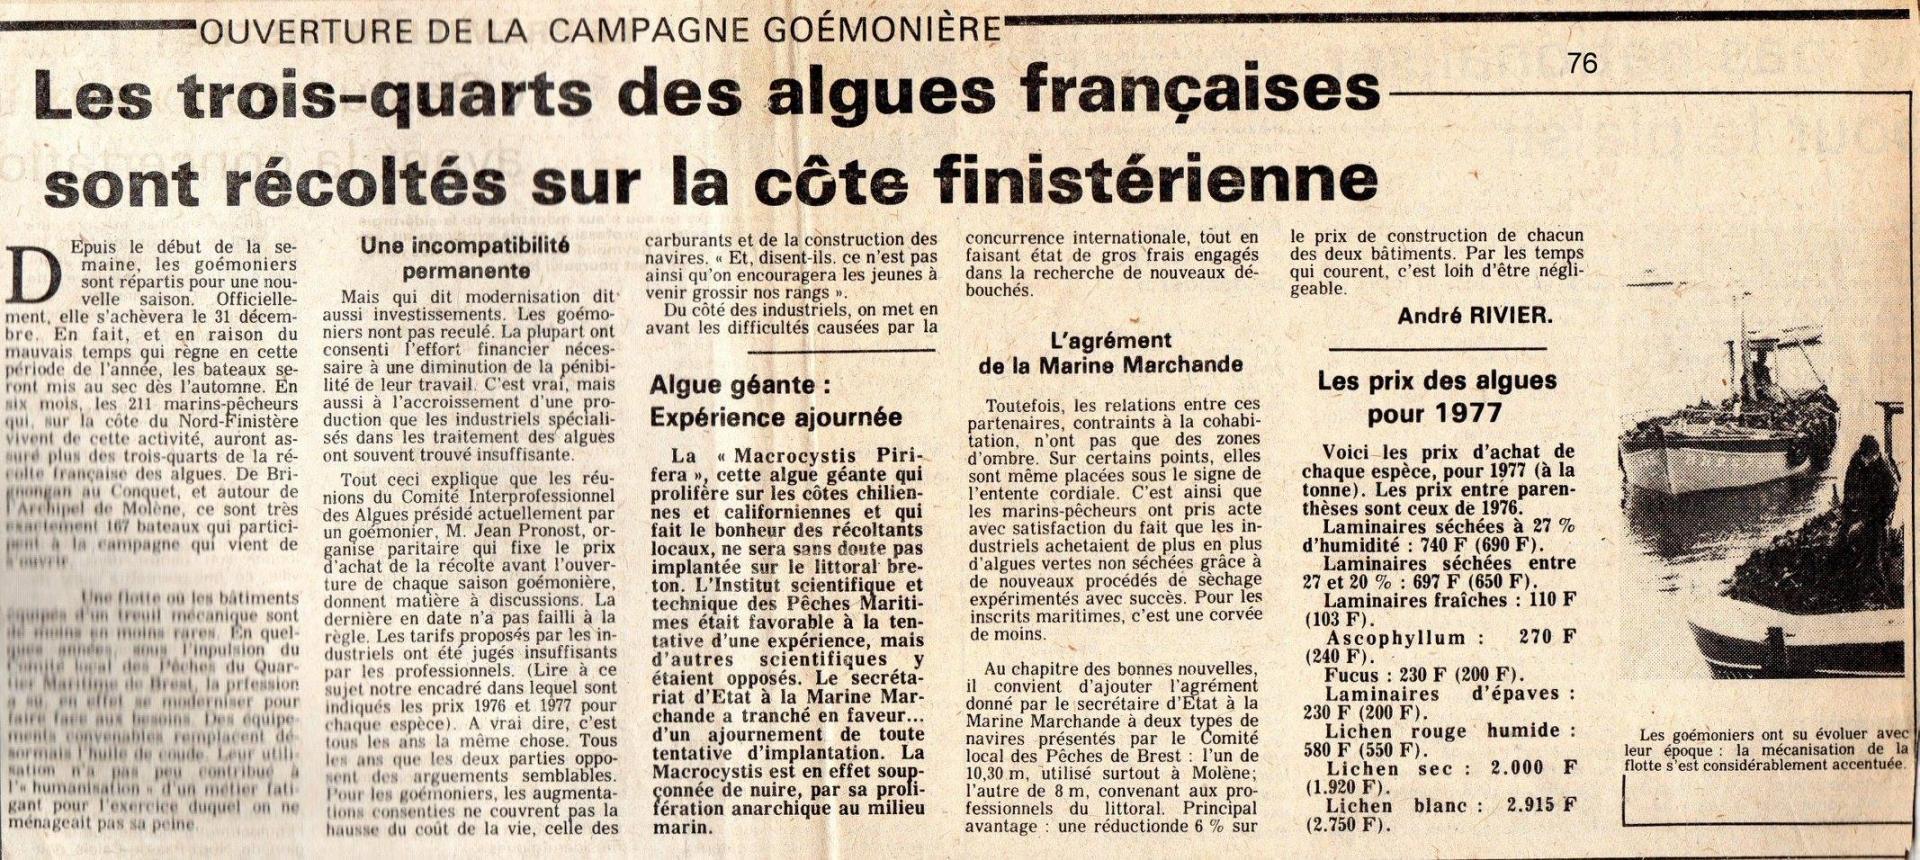 Campagne goemoniere 1976 77